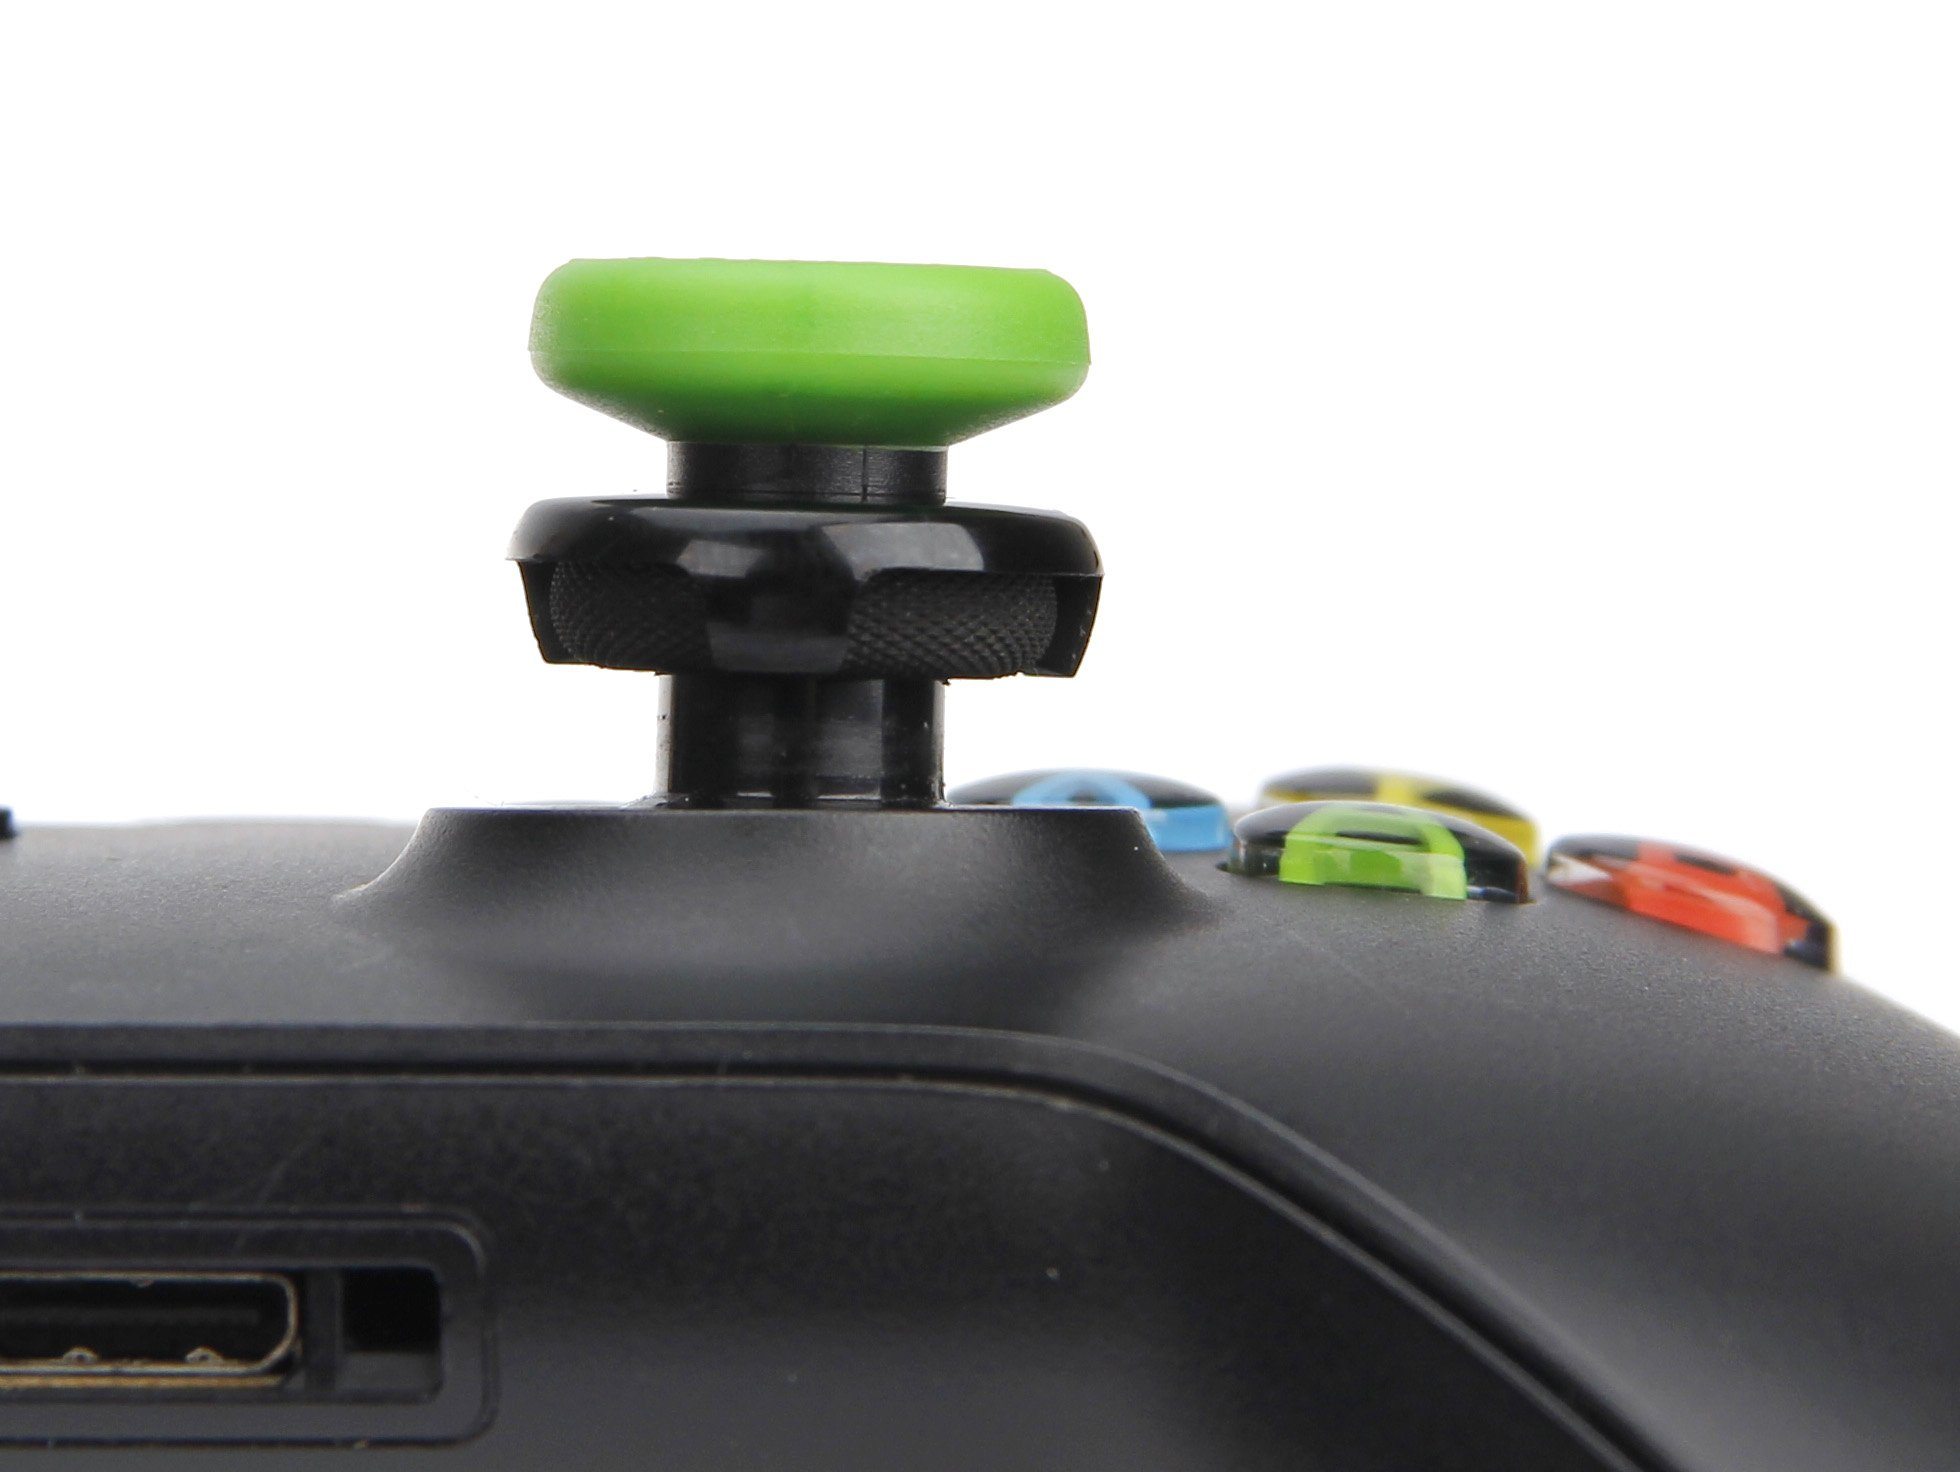 AmazonBasics Xbox One Controller Thumb Grips - 4-Pack, Black and Green by AmazonBasics (Image #2)